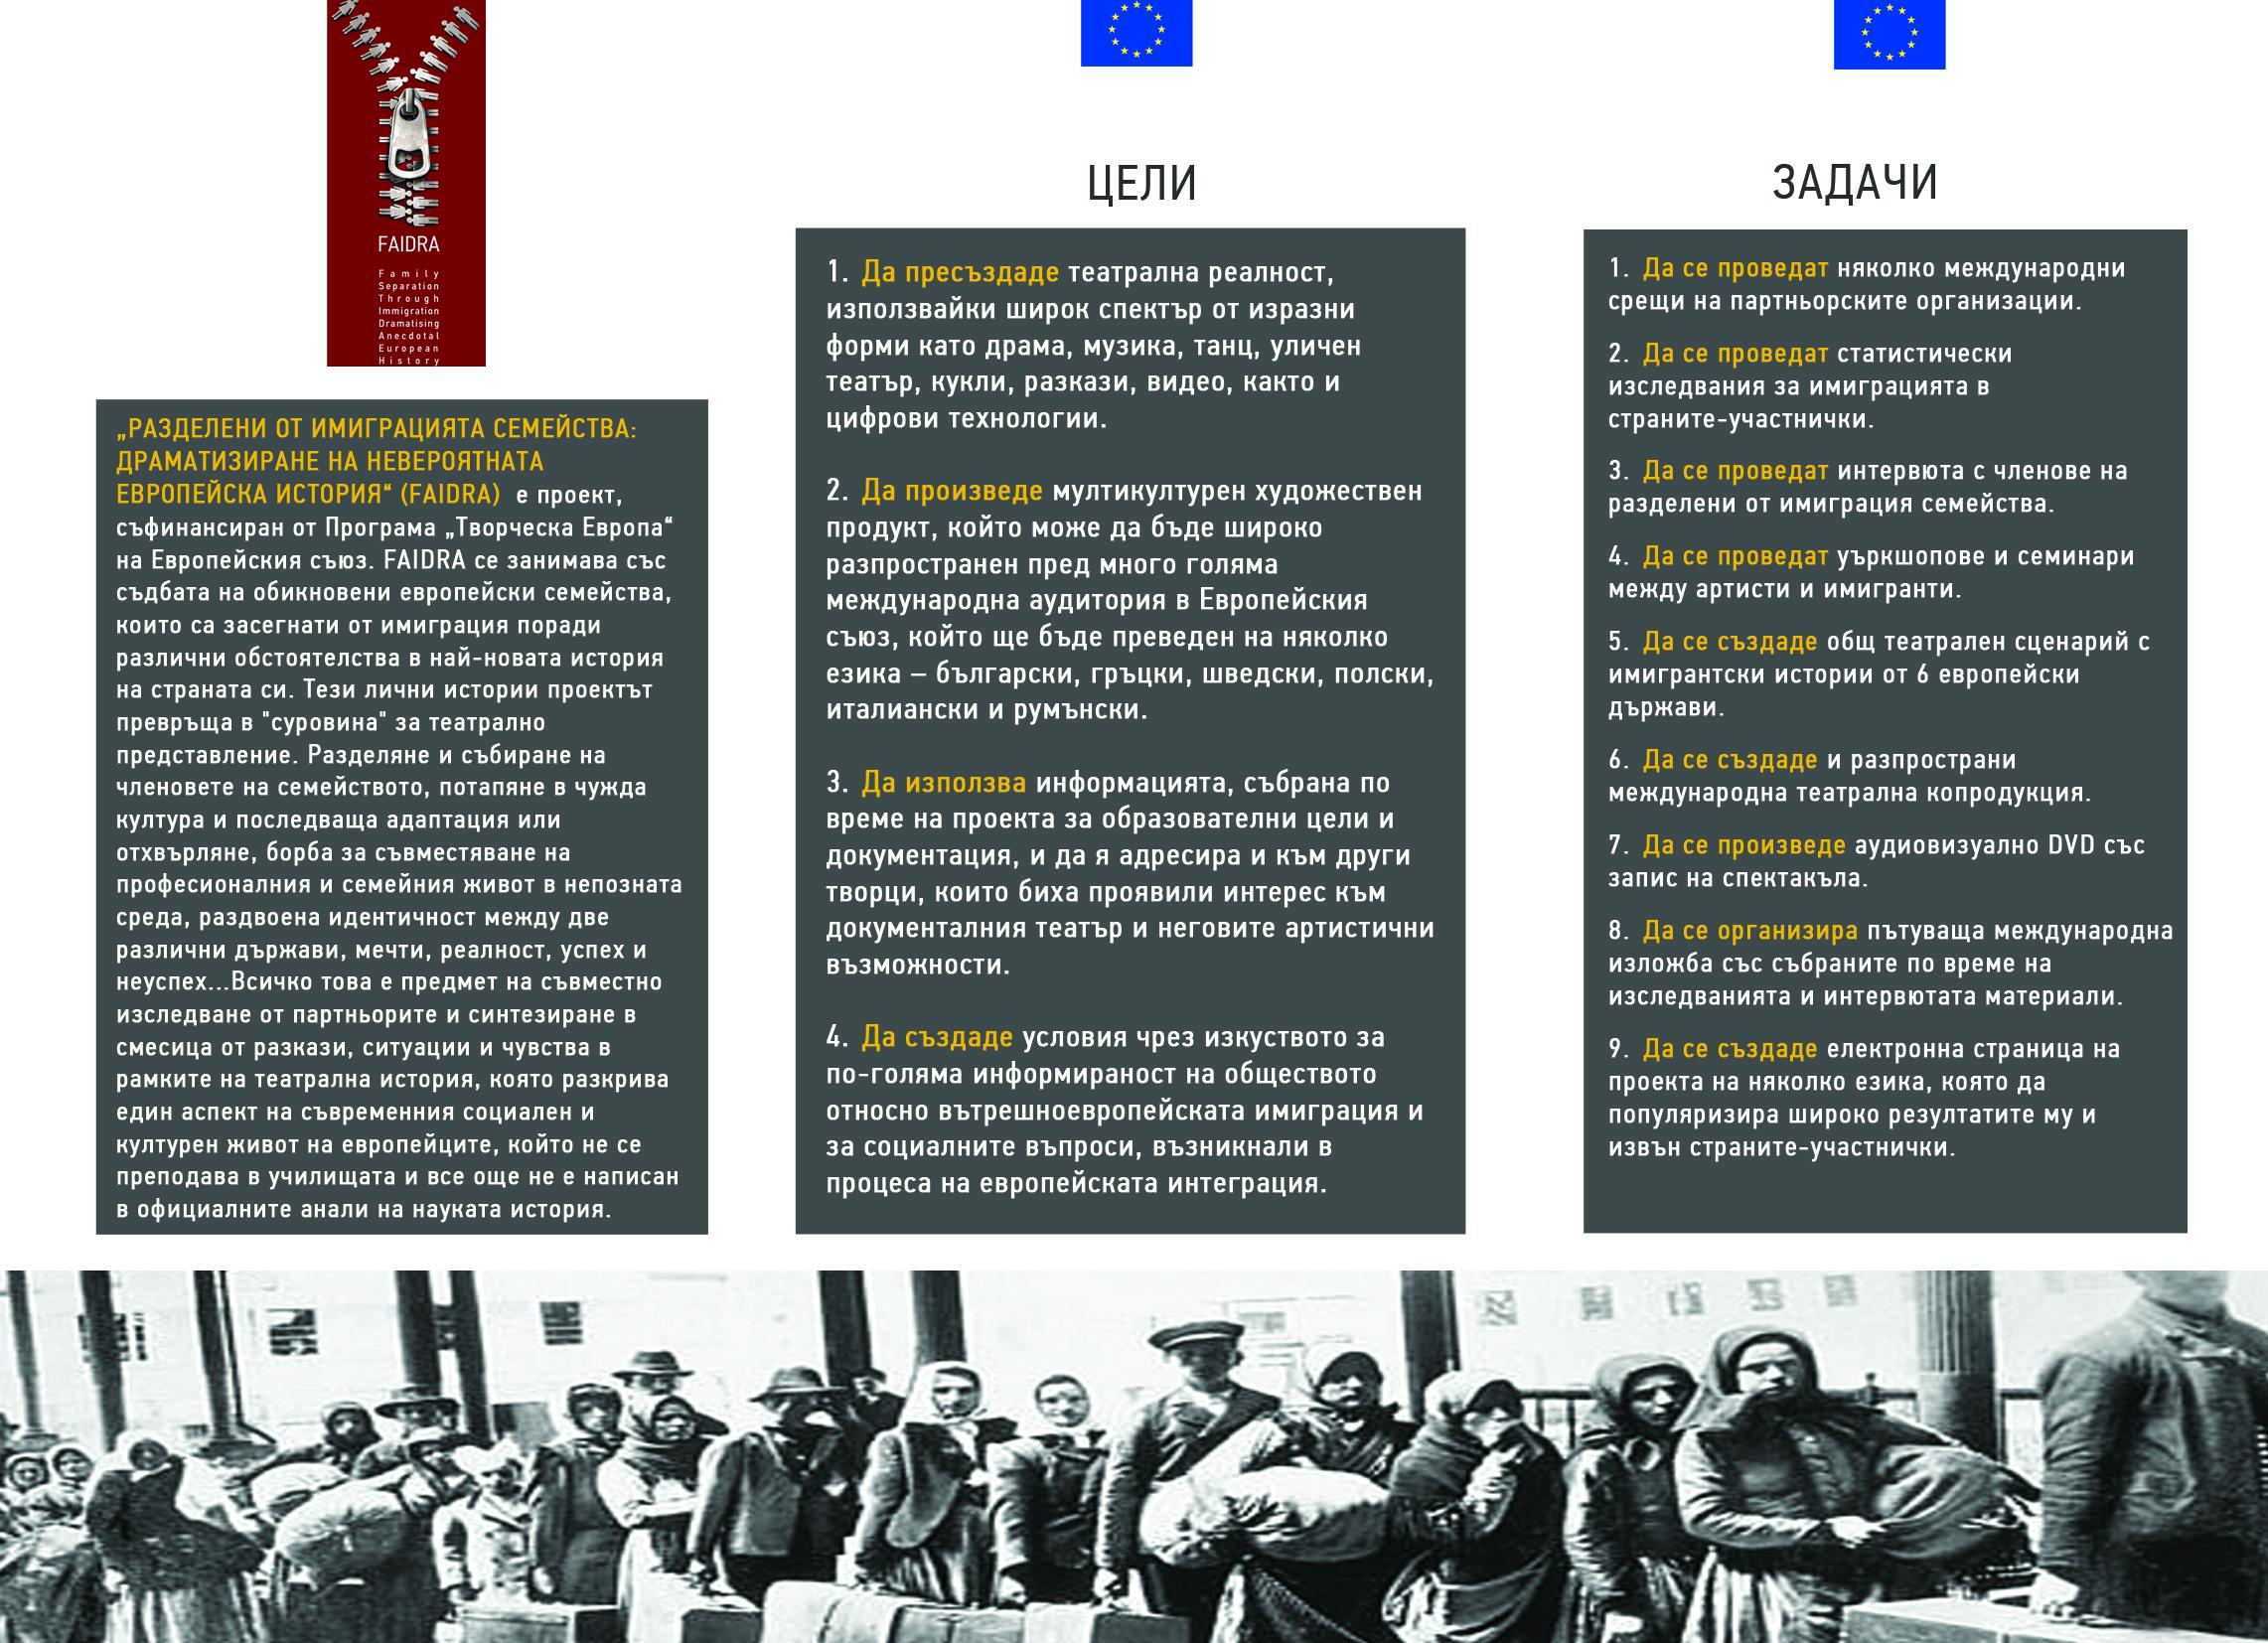 faidra-flyer-page-1-a_bg